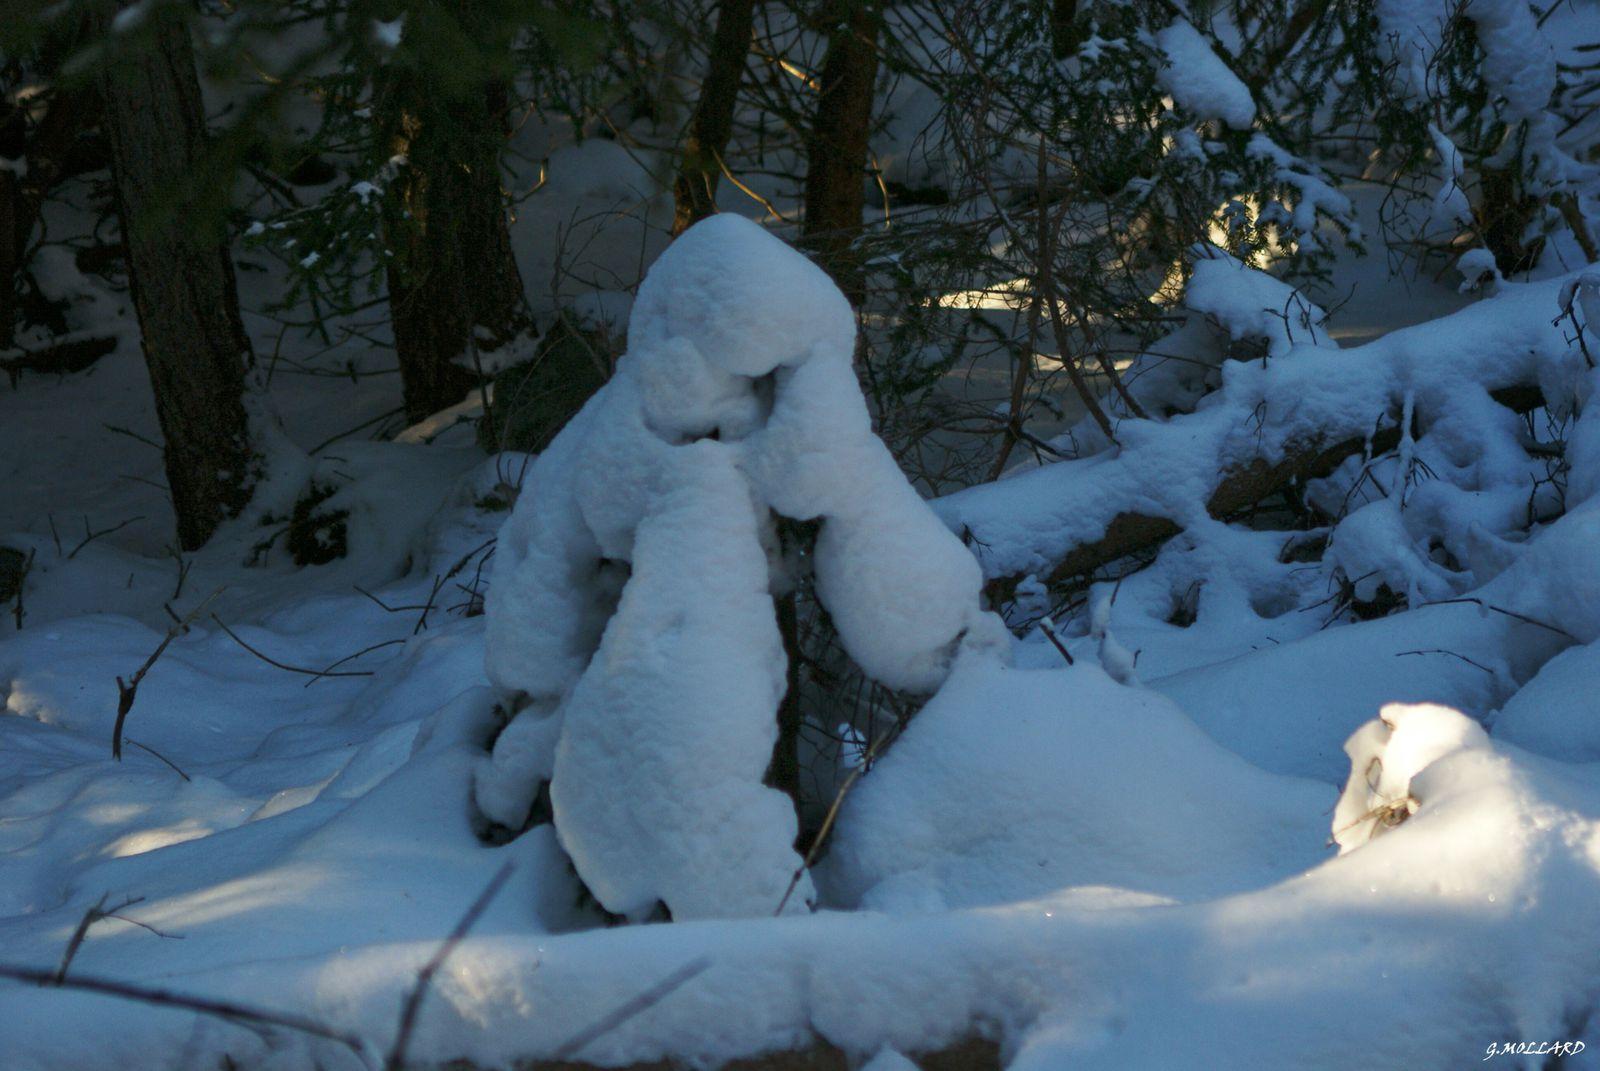 Rando,neige,glace,photos d'hiver.